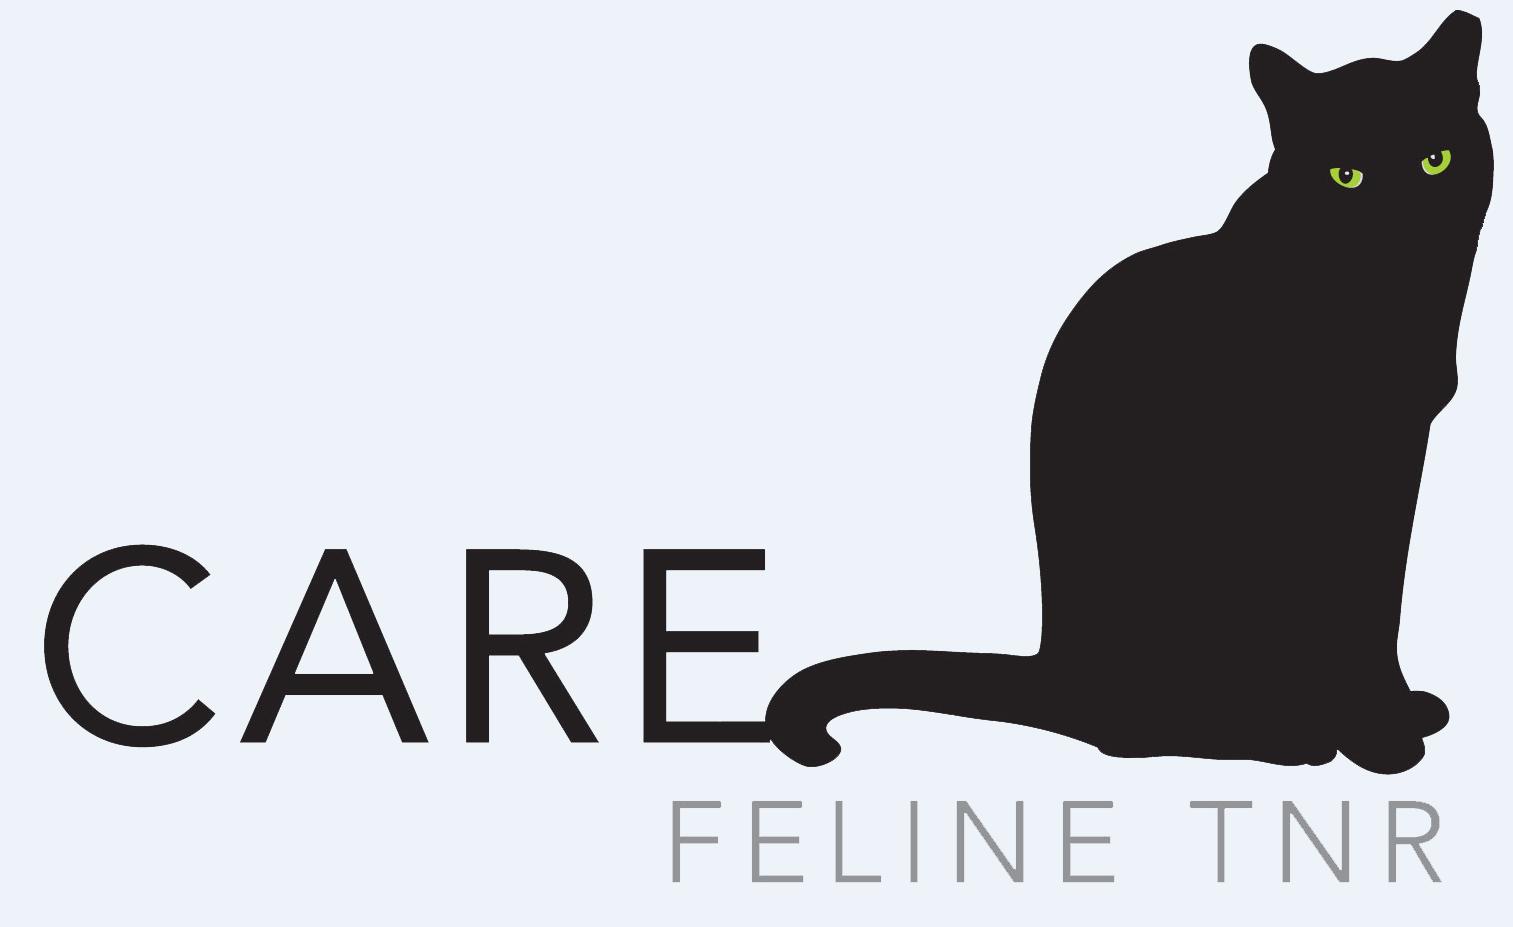 CARE Feline TNR